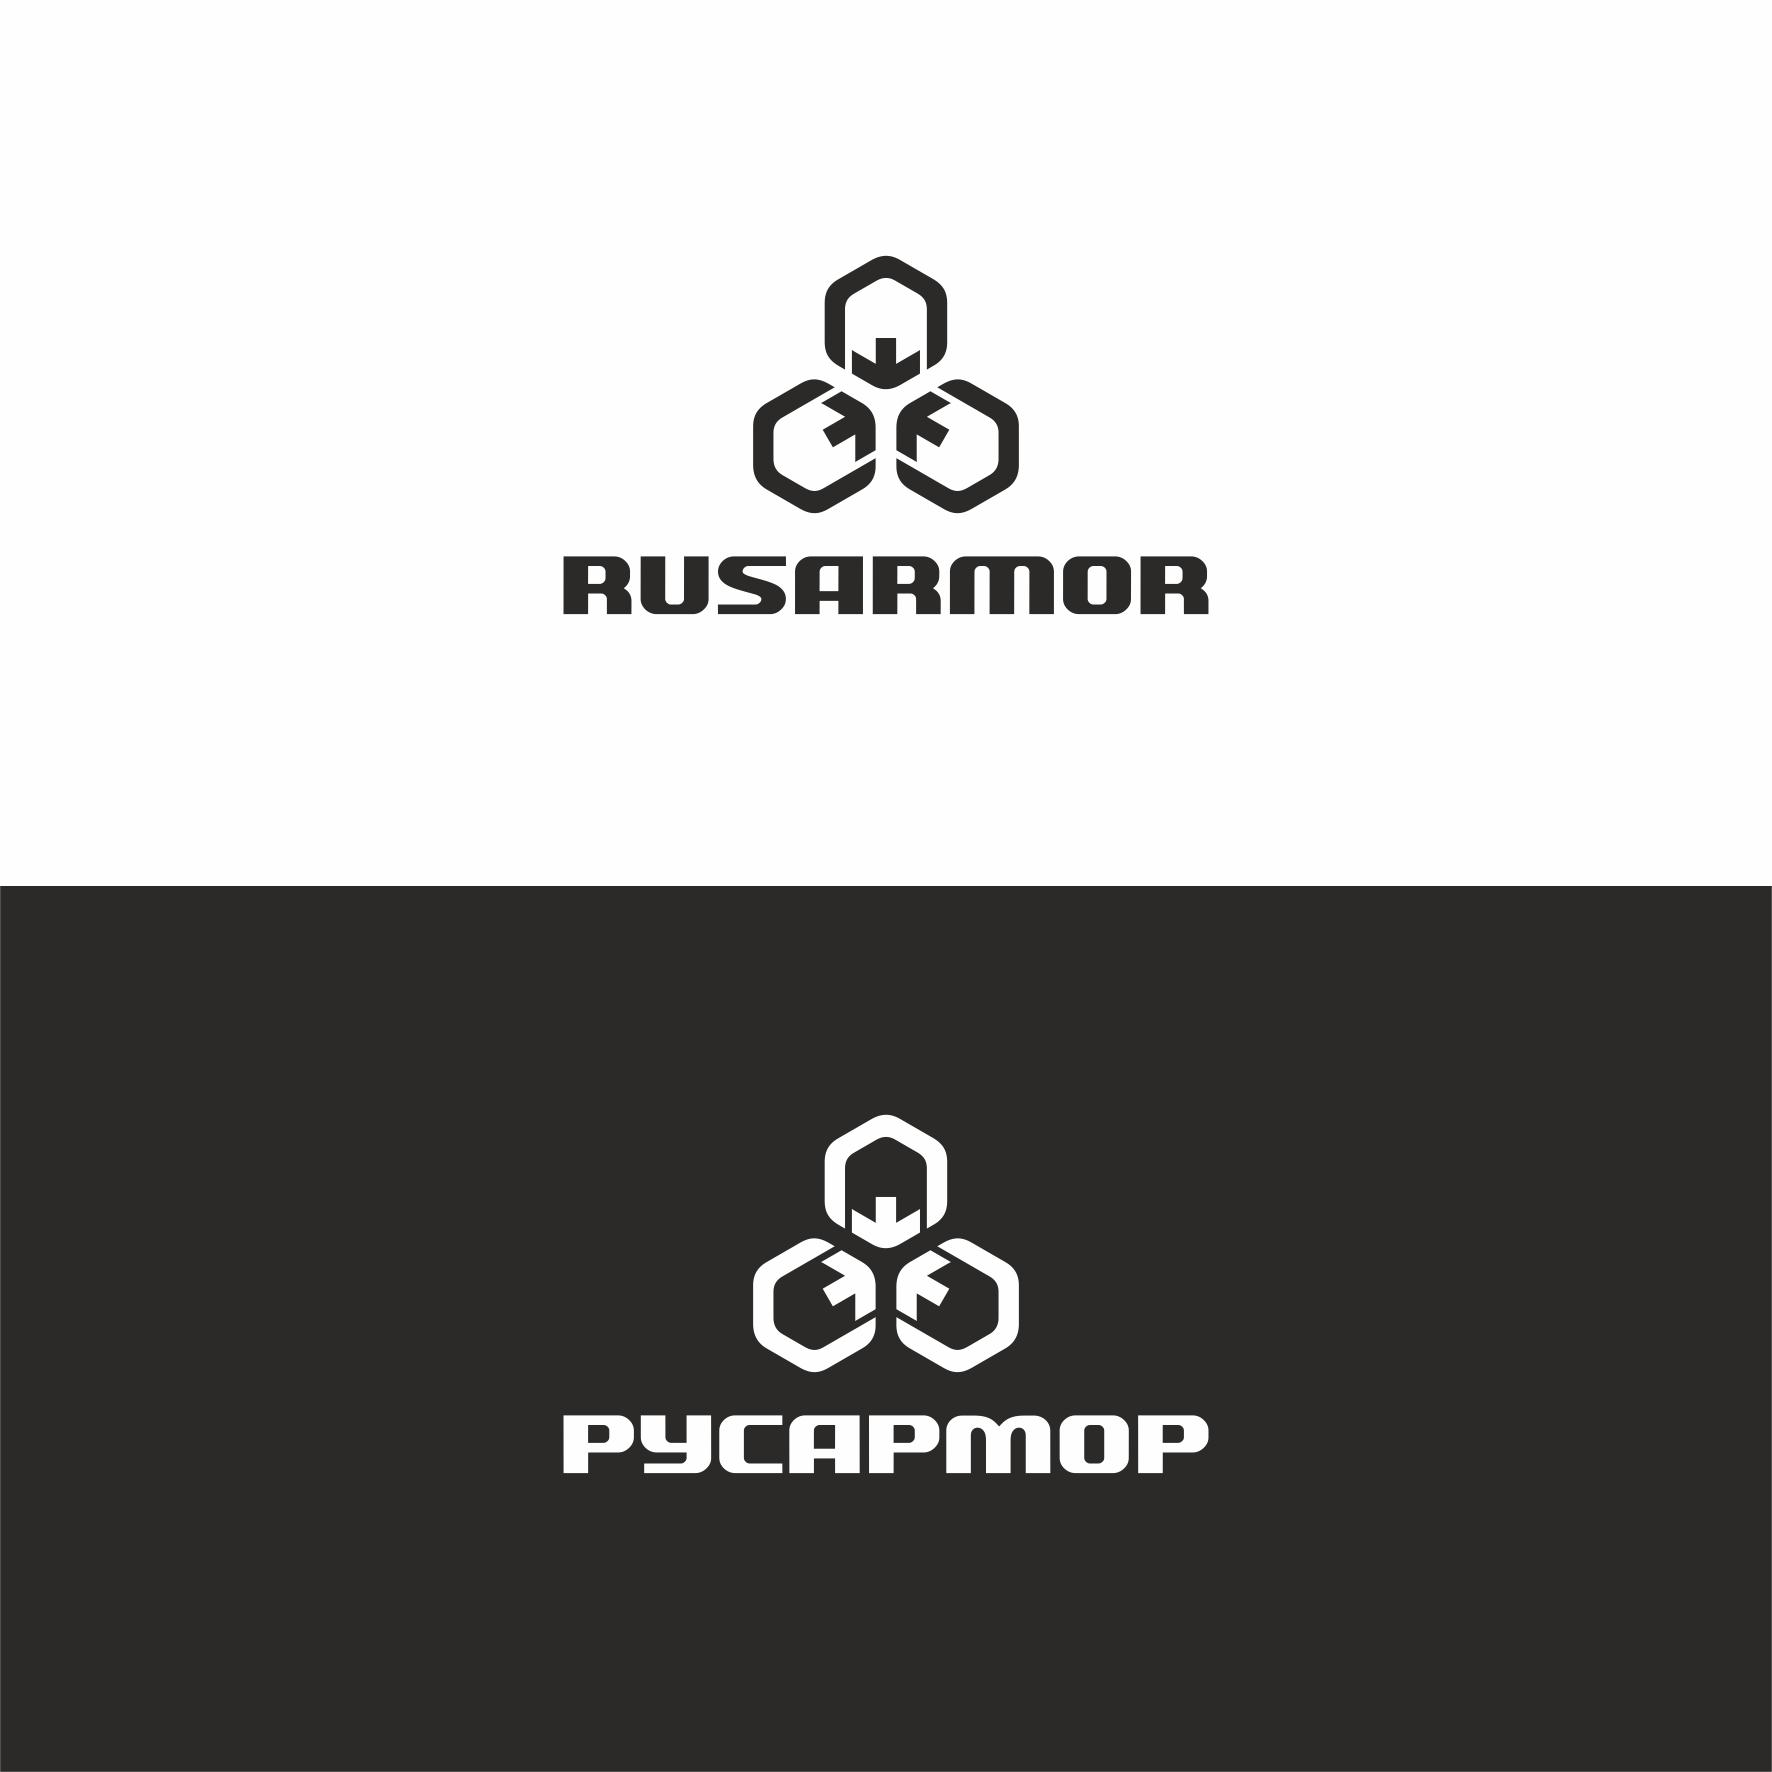 Разработка логотипа технологического стартапа РУСАРМОР фото f_4205a09580c2455f.jpg